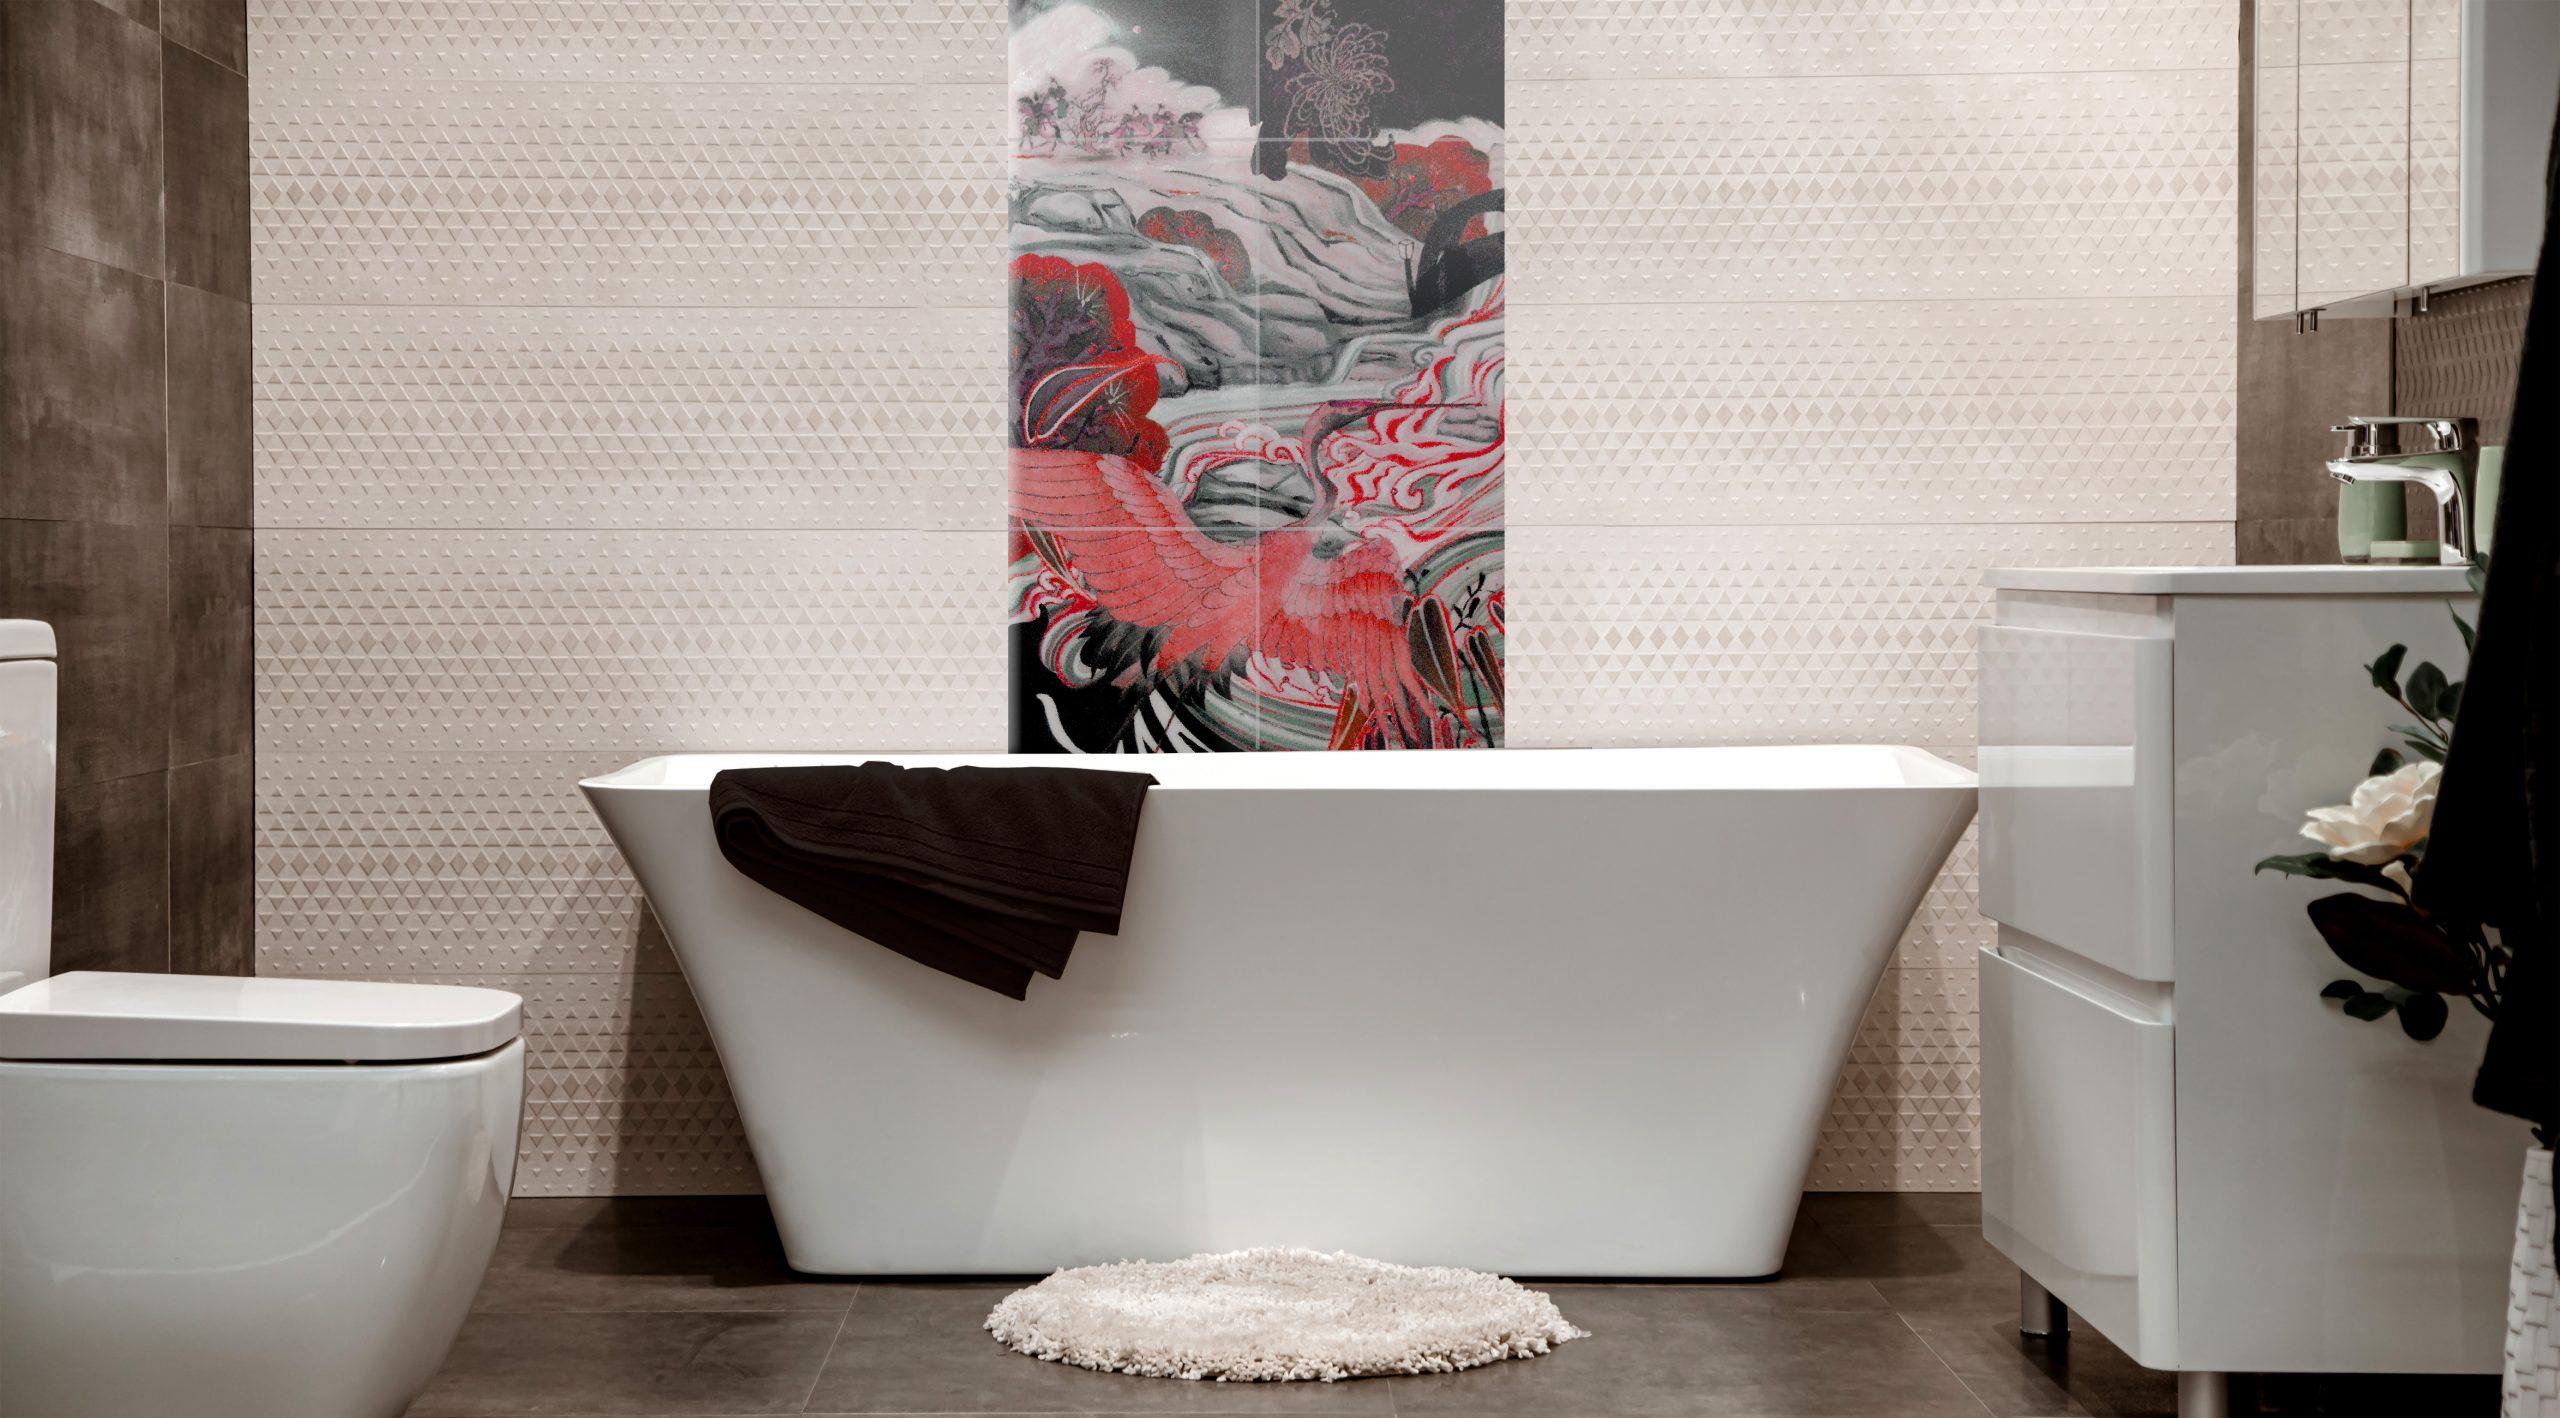 Japanese style tile mural above modern bath